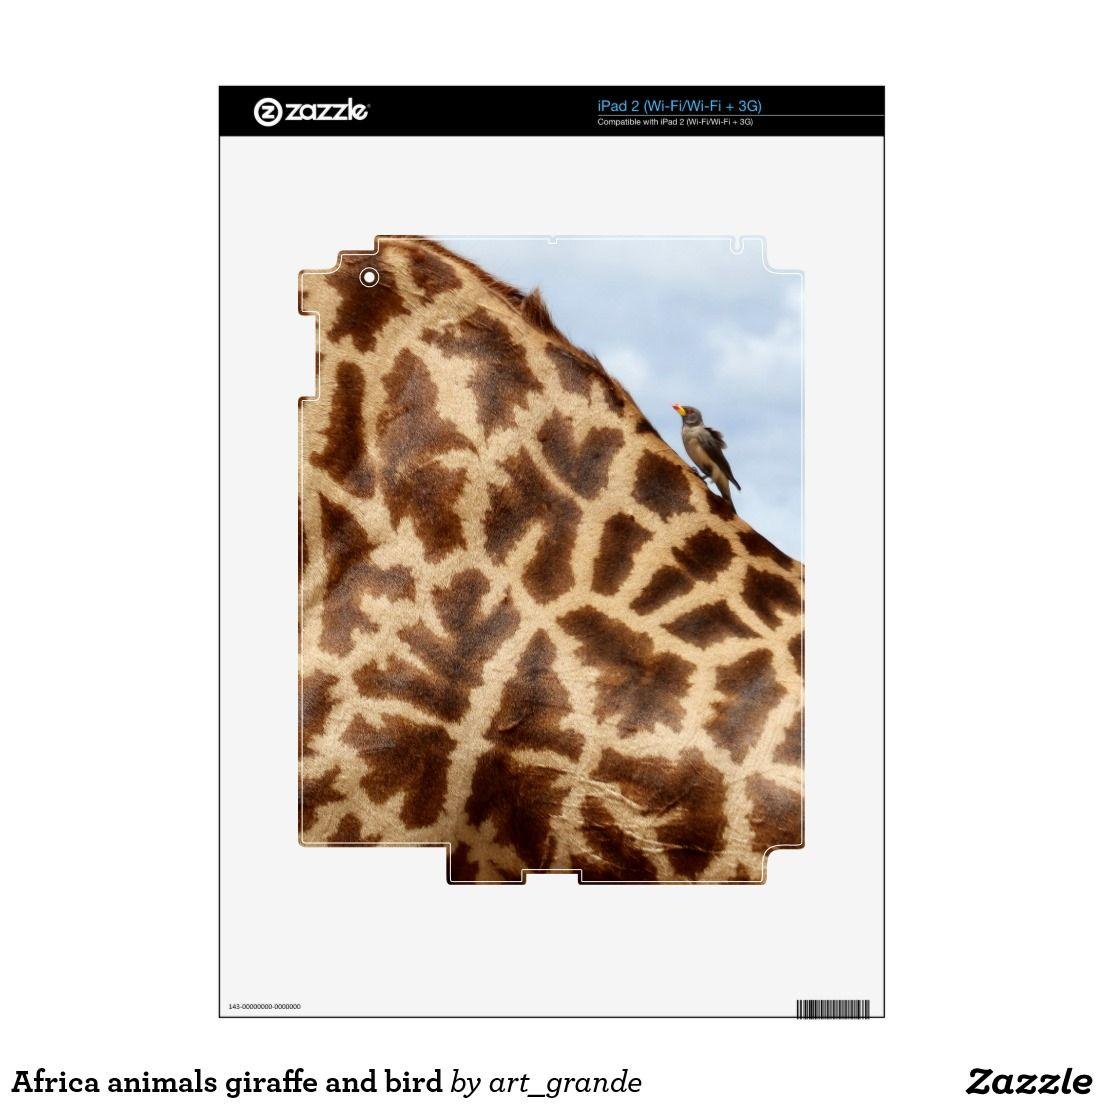 Africa animals giraffe and bird iPad 2 decals